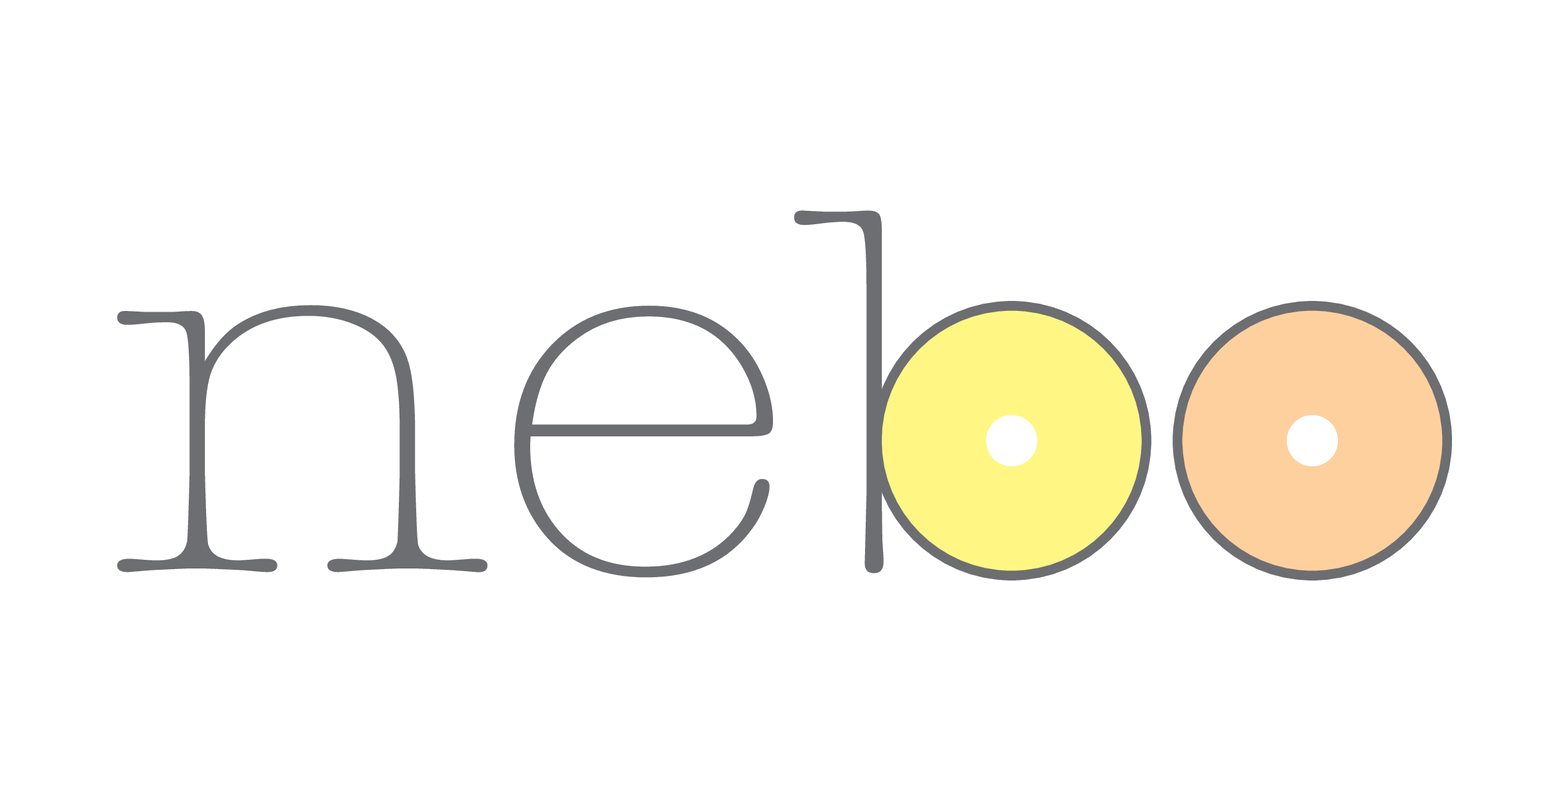 nebo_logo_transparent_mel-2